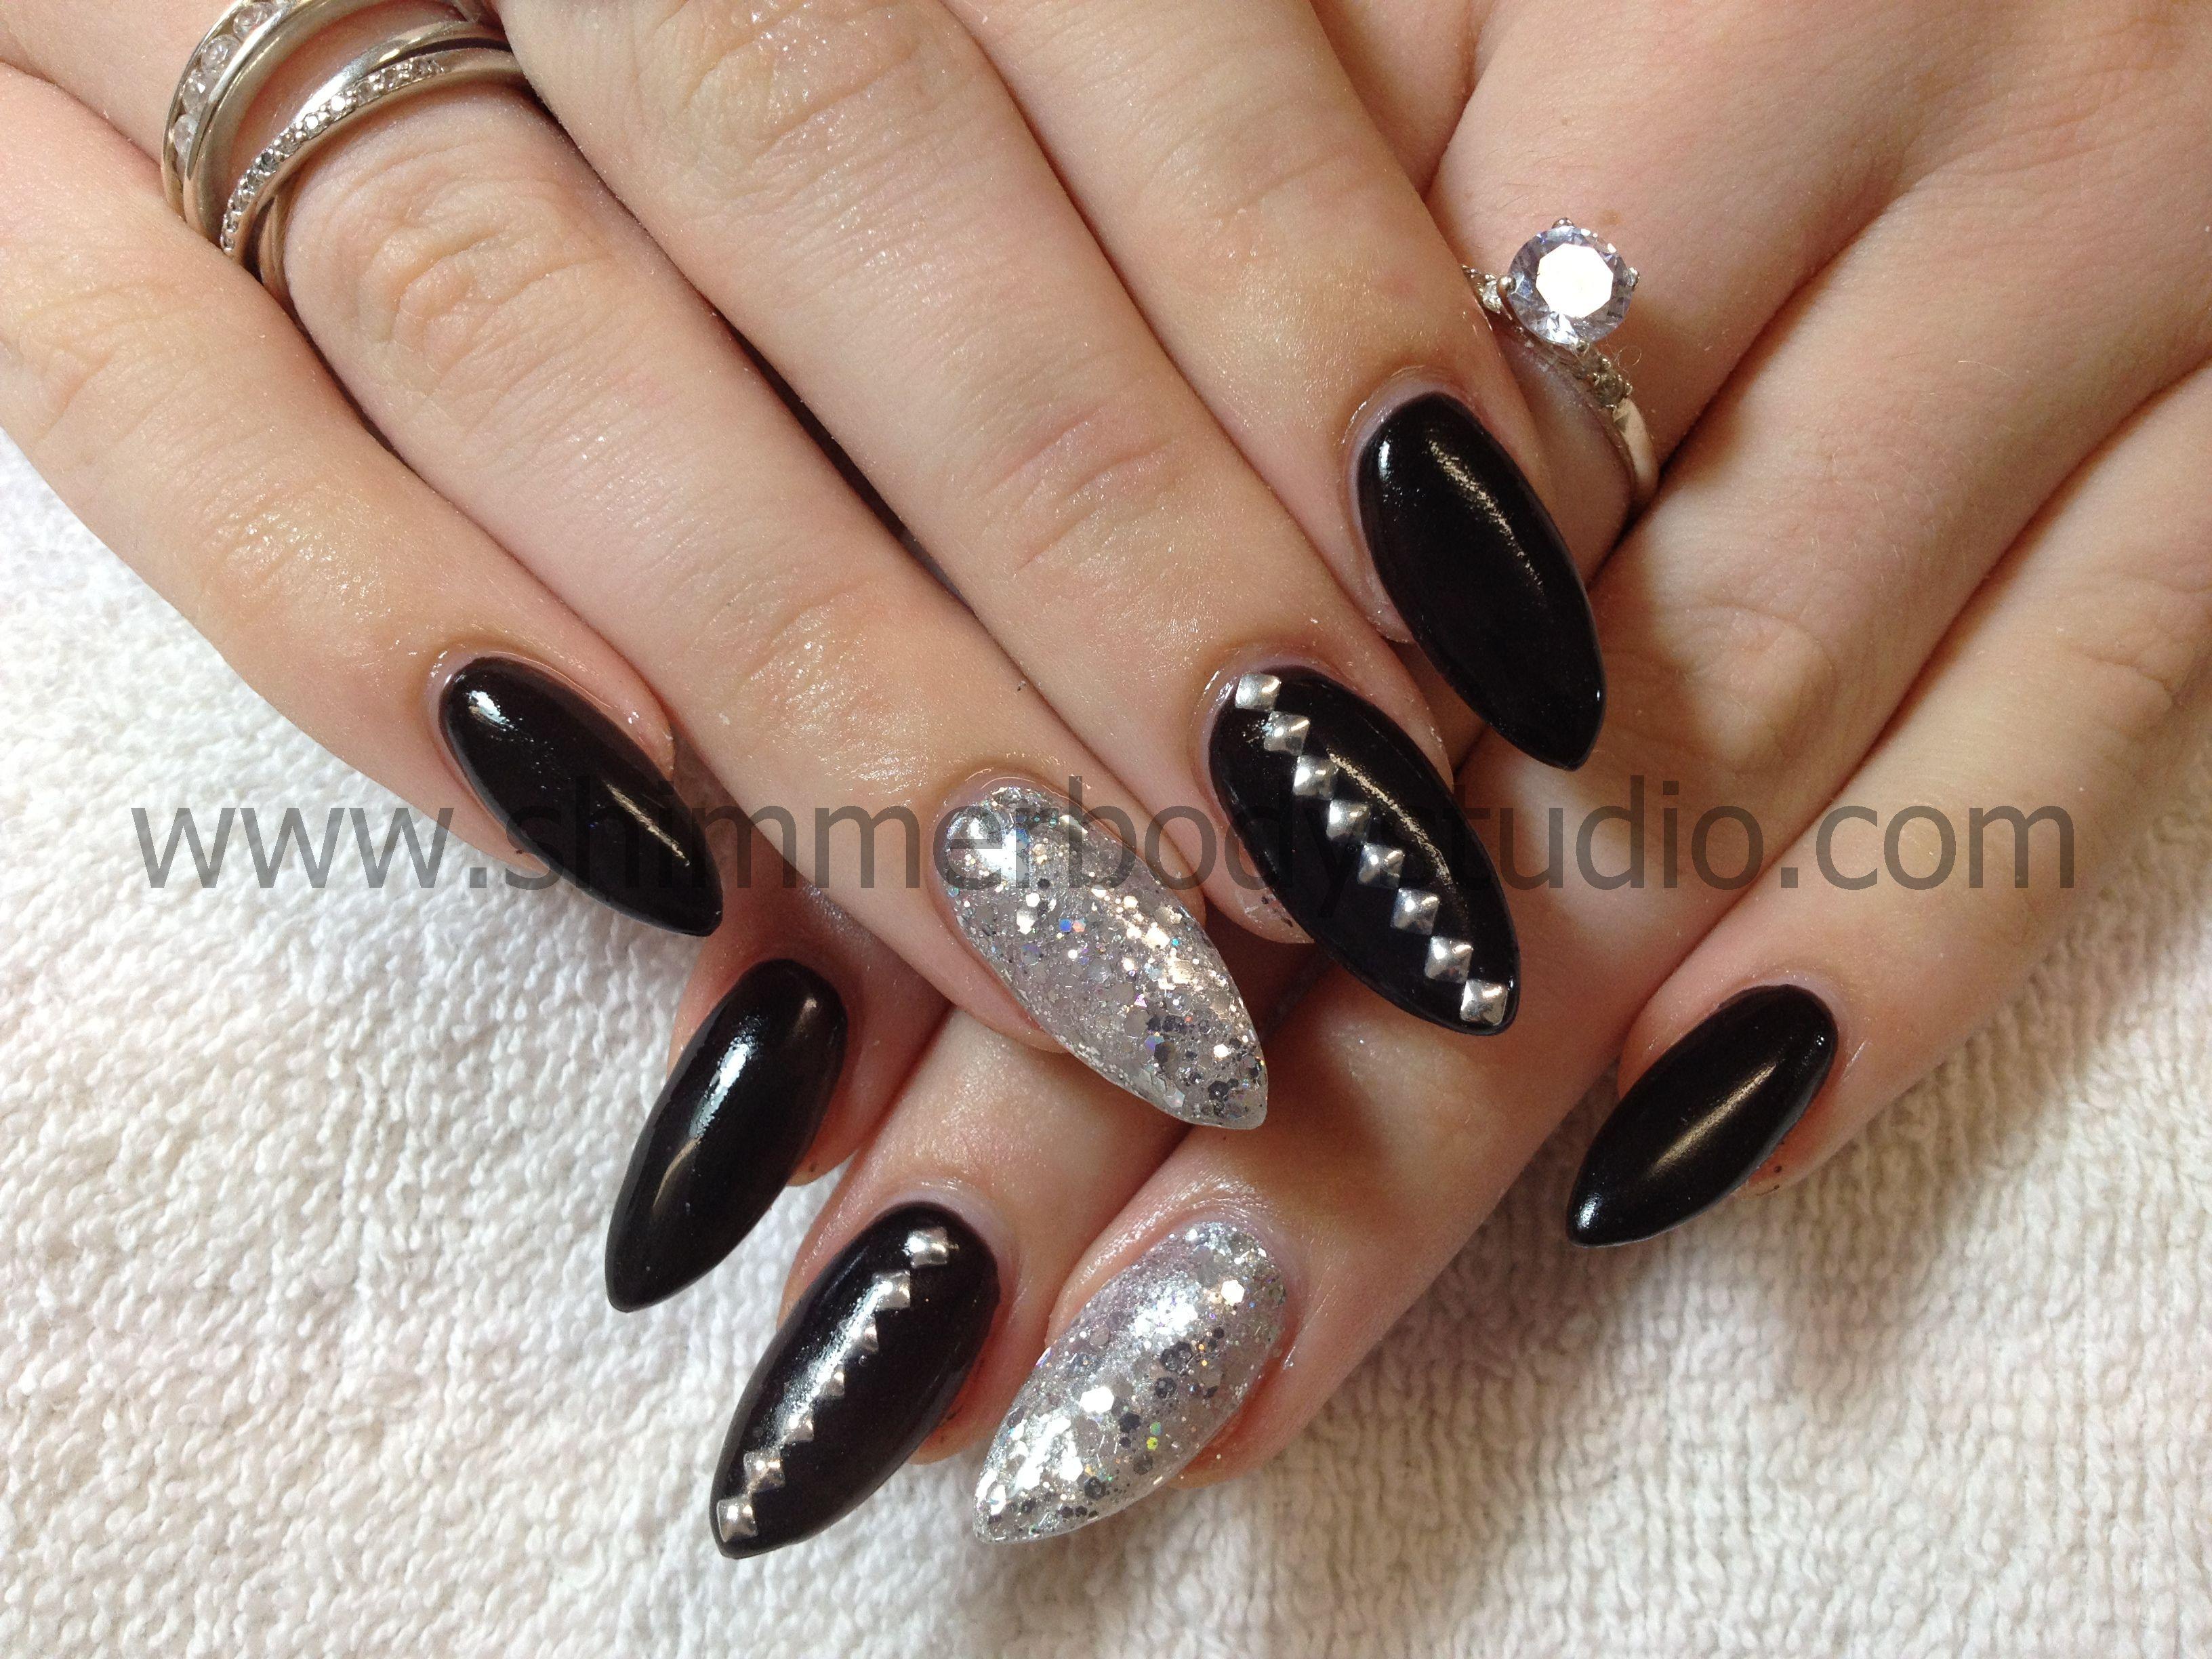 Full color nail art - Gel Nails Pointed Nails Almond Nails Stiletto Nails Glitter Nail Art